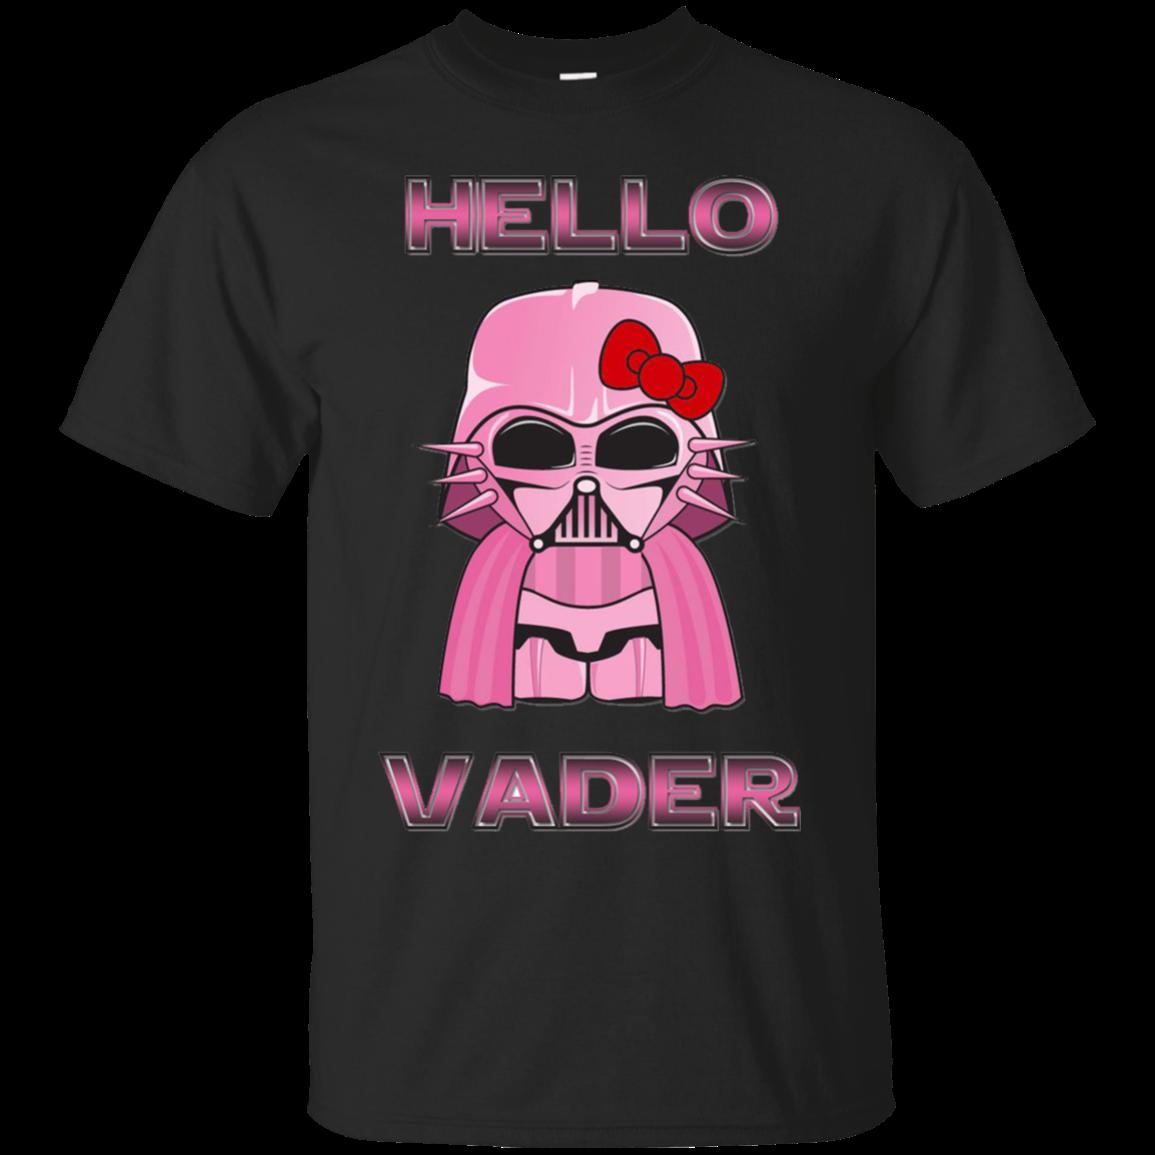 Hello Kitty Star Wars Darth Vader Shirts Hello Vader - Amyna - Hello Kitty Merchandise